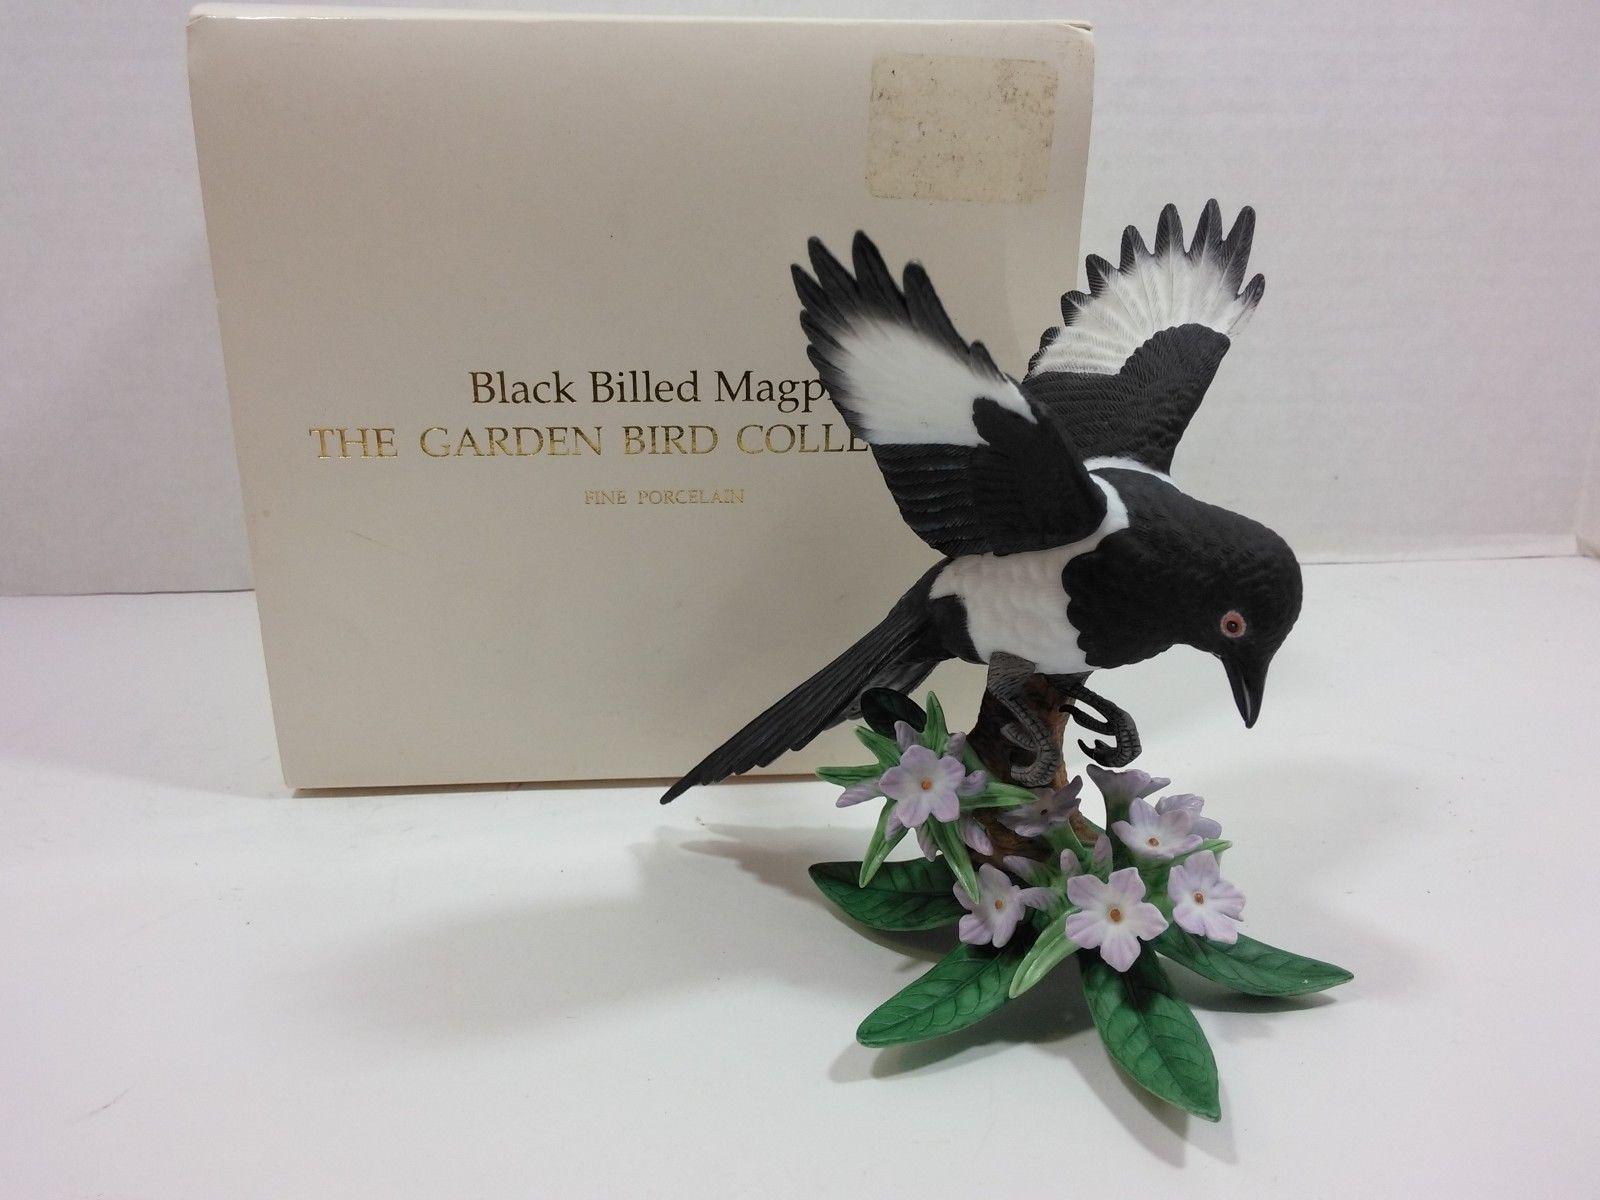 THE LENOX GARDEN BIRD COLLECTION Black Billed Magpie (Fine Porcelain 2002) image 5